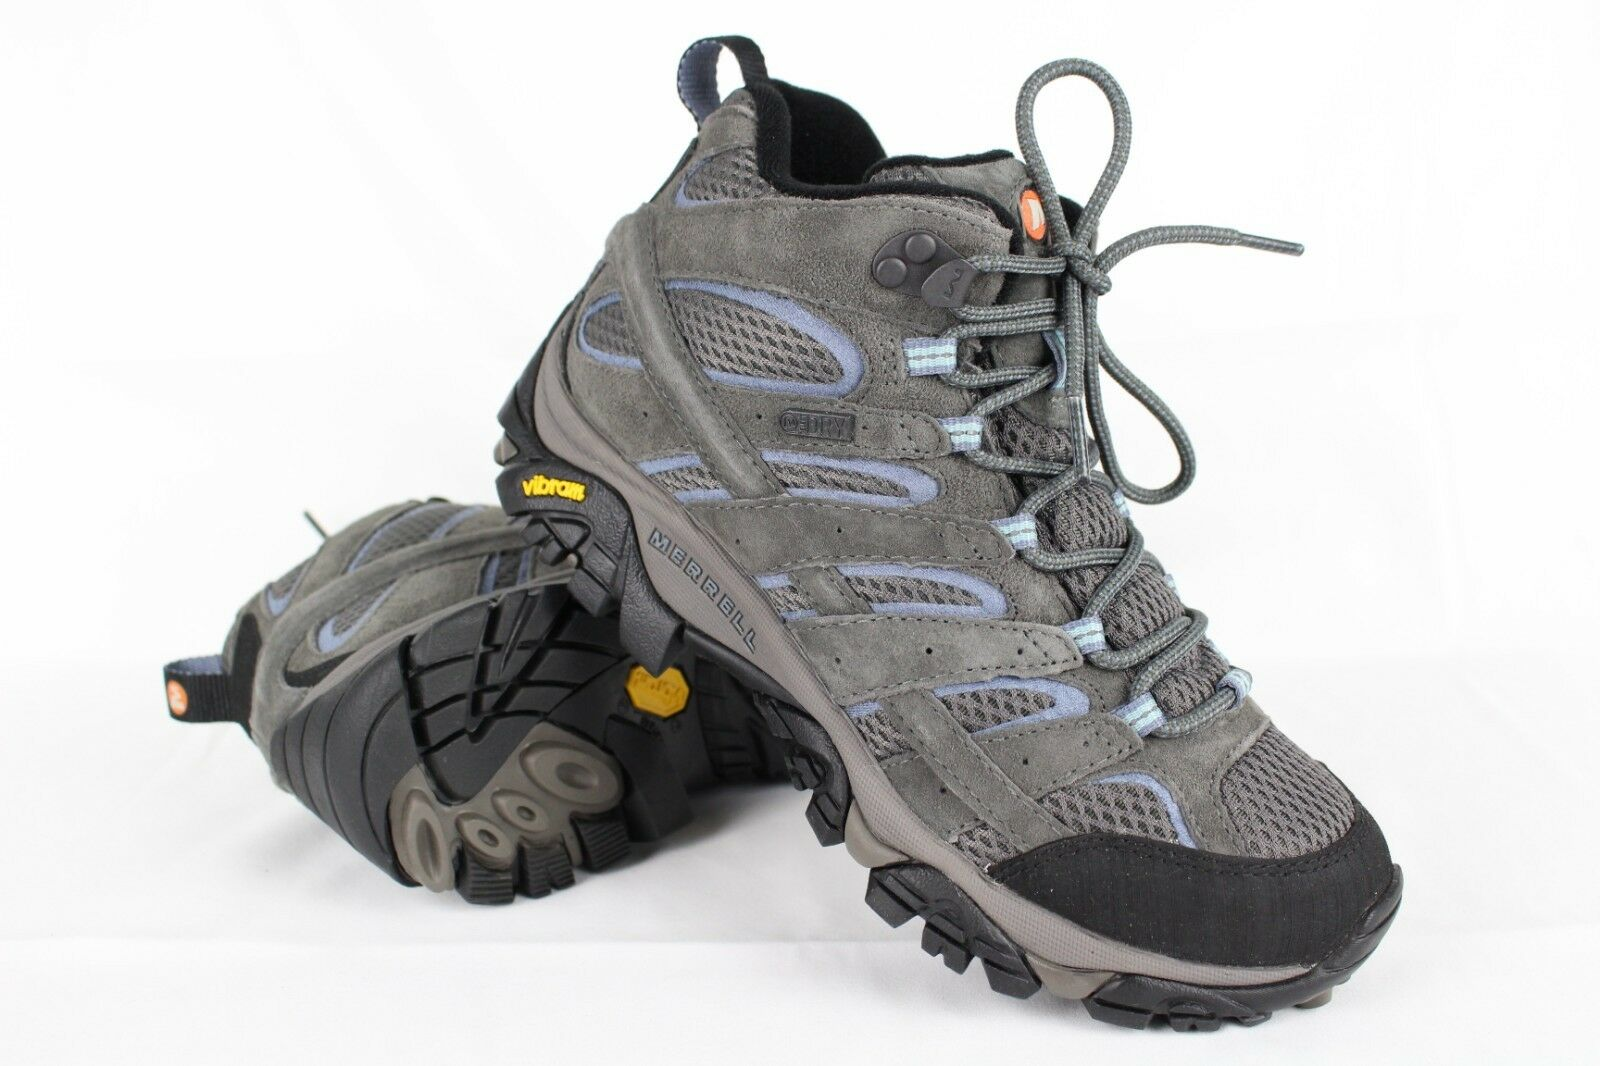 New New New Merrell Para Mujer botas Para Excursionismo A Prueba De Agua Moab 2 Mid Granito   J06054  mejor moda